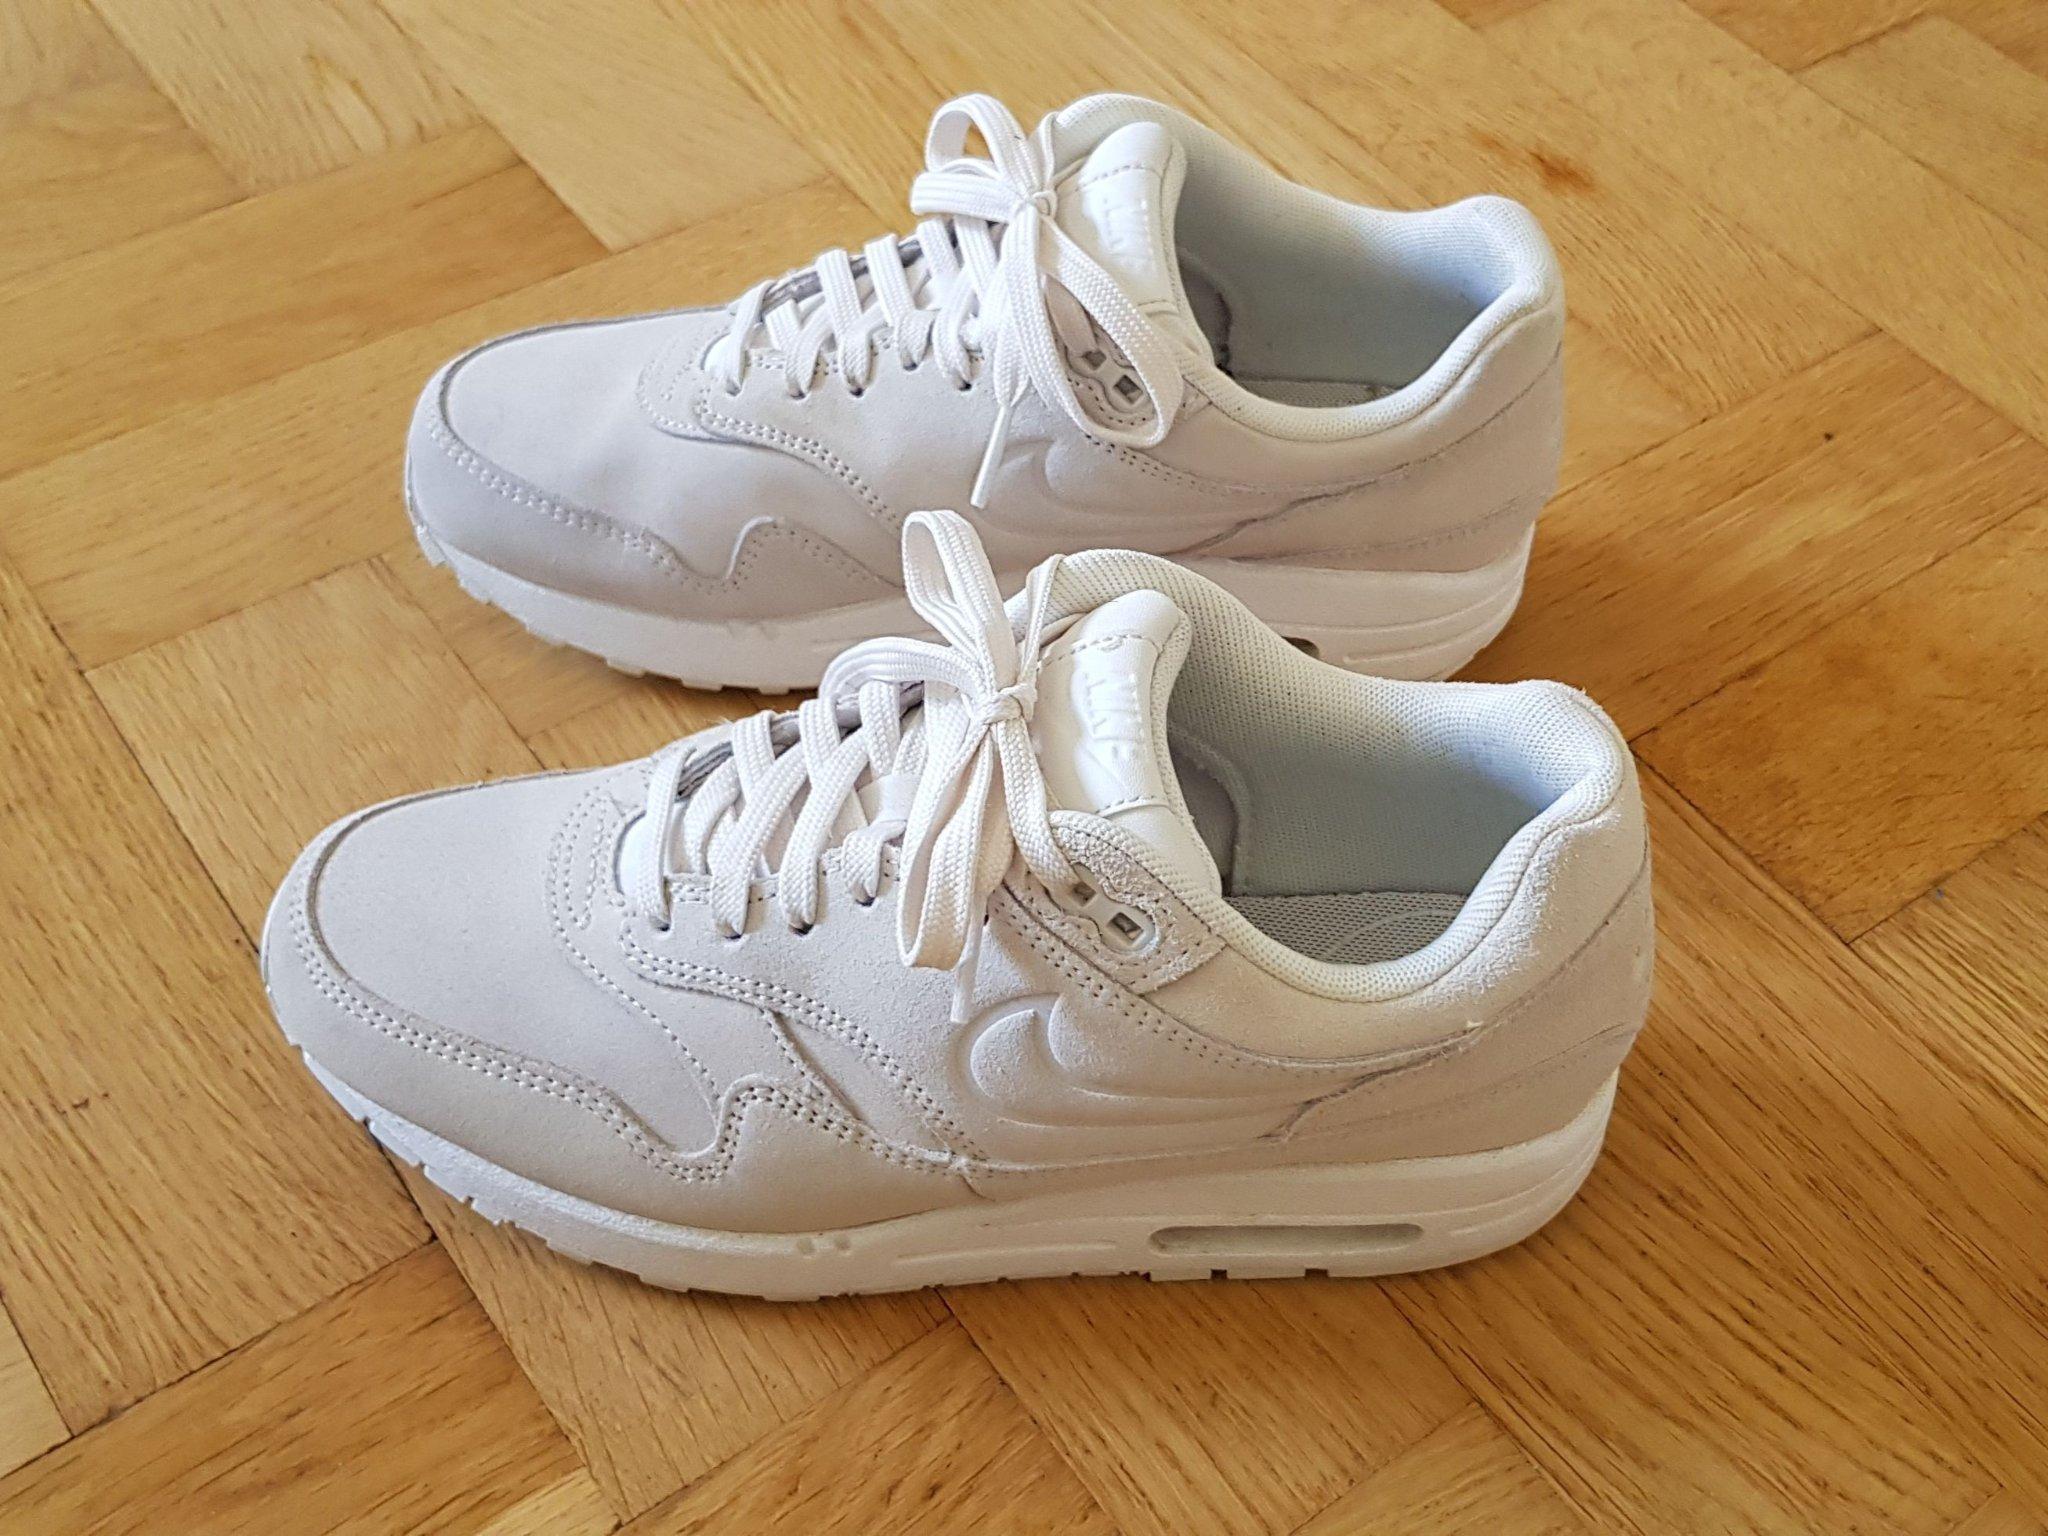 Nike air max 90 dam 37.5